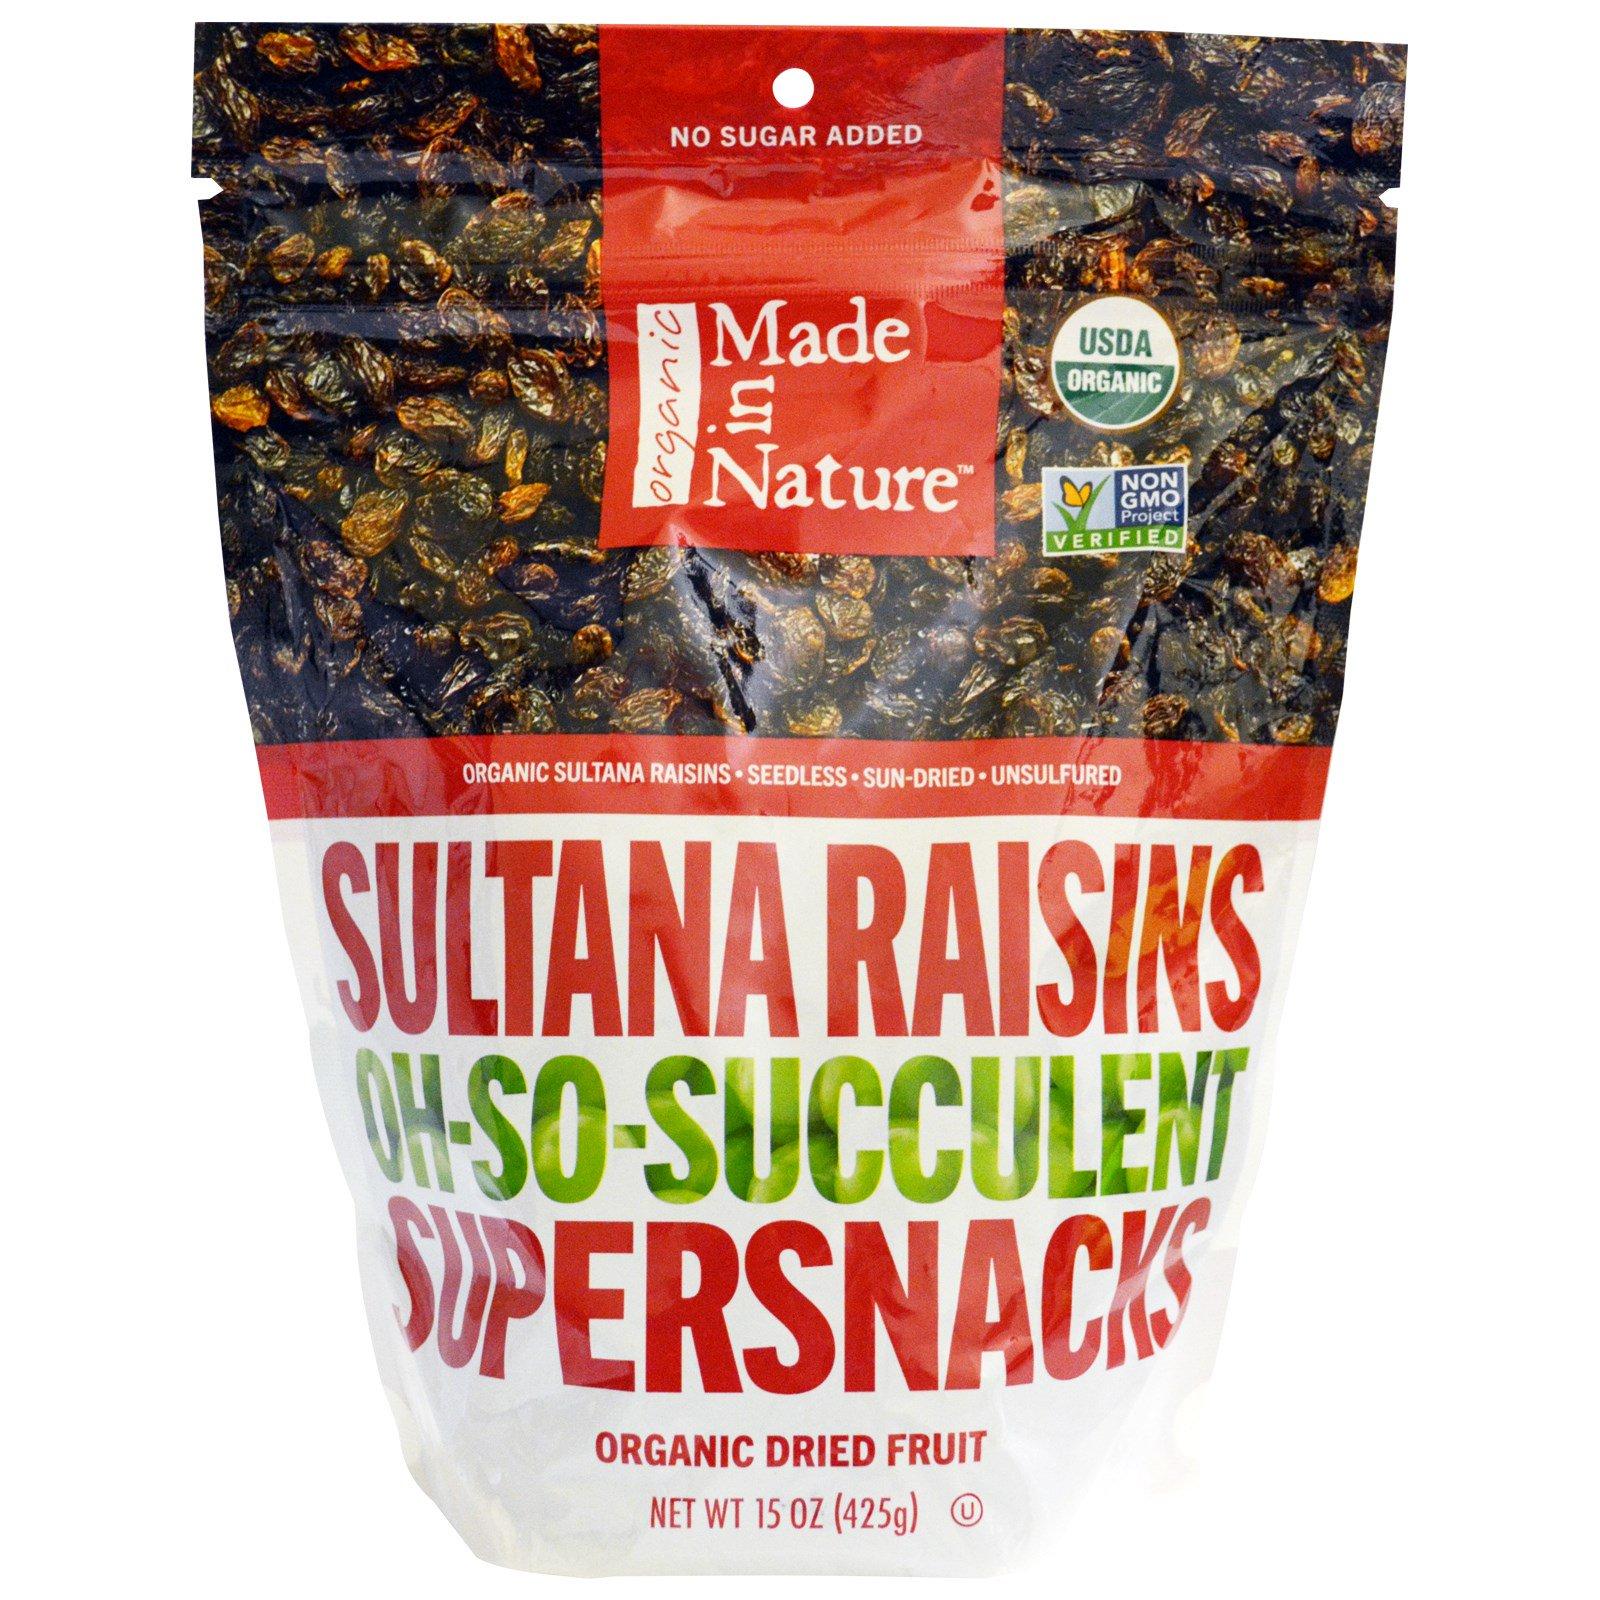 Made in Nature, Сочный органический изюм Sultana, суперзакуска, 15 унций (425 г)